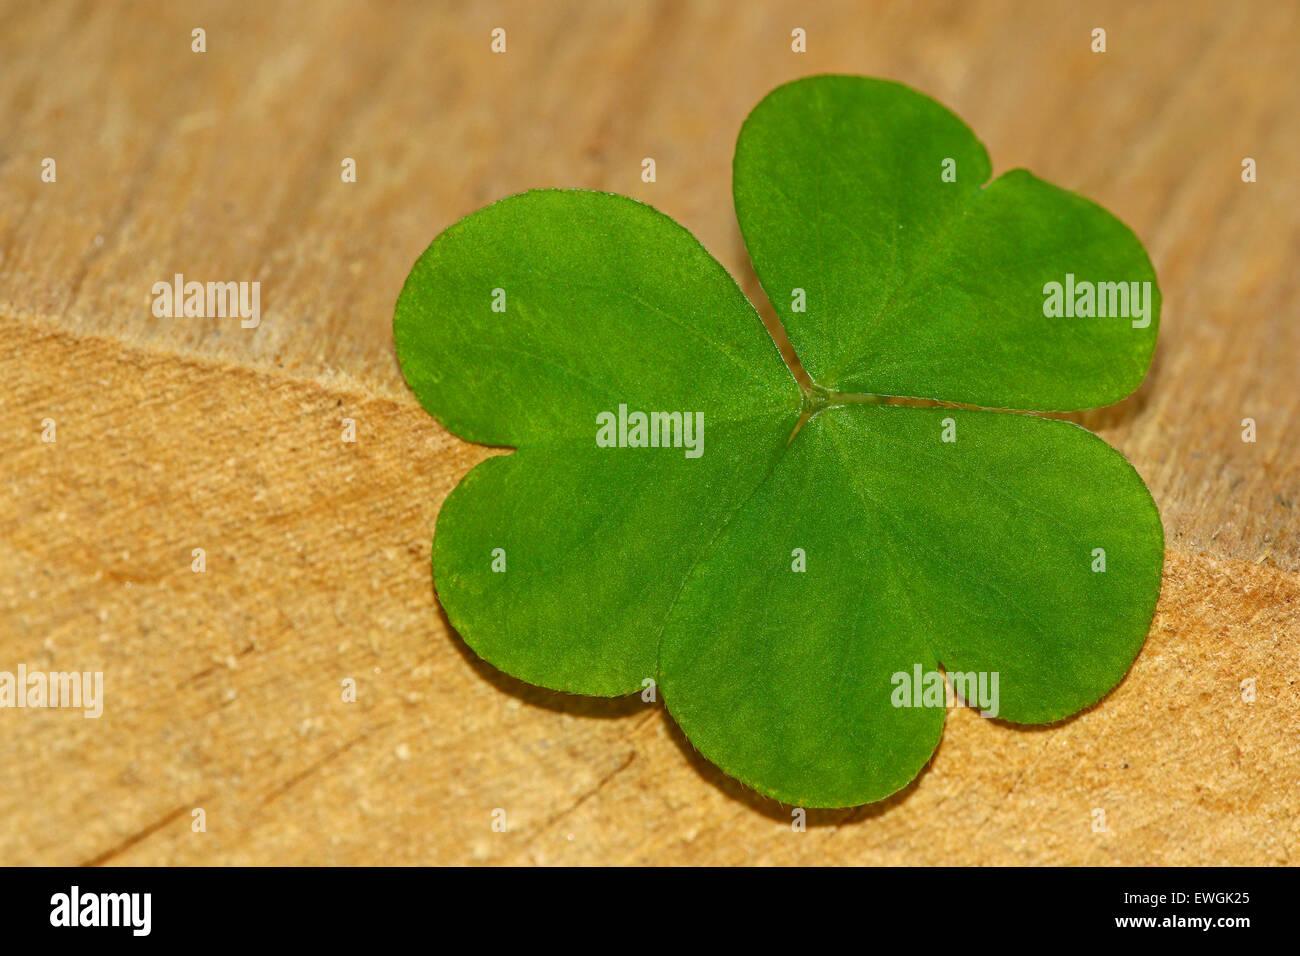 Clover Leaf Stock Photos Clover Leaf Stock Images Alamy